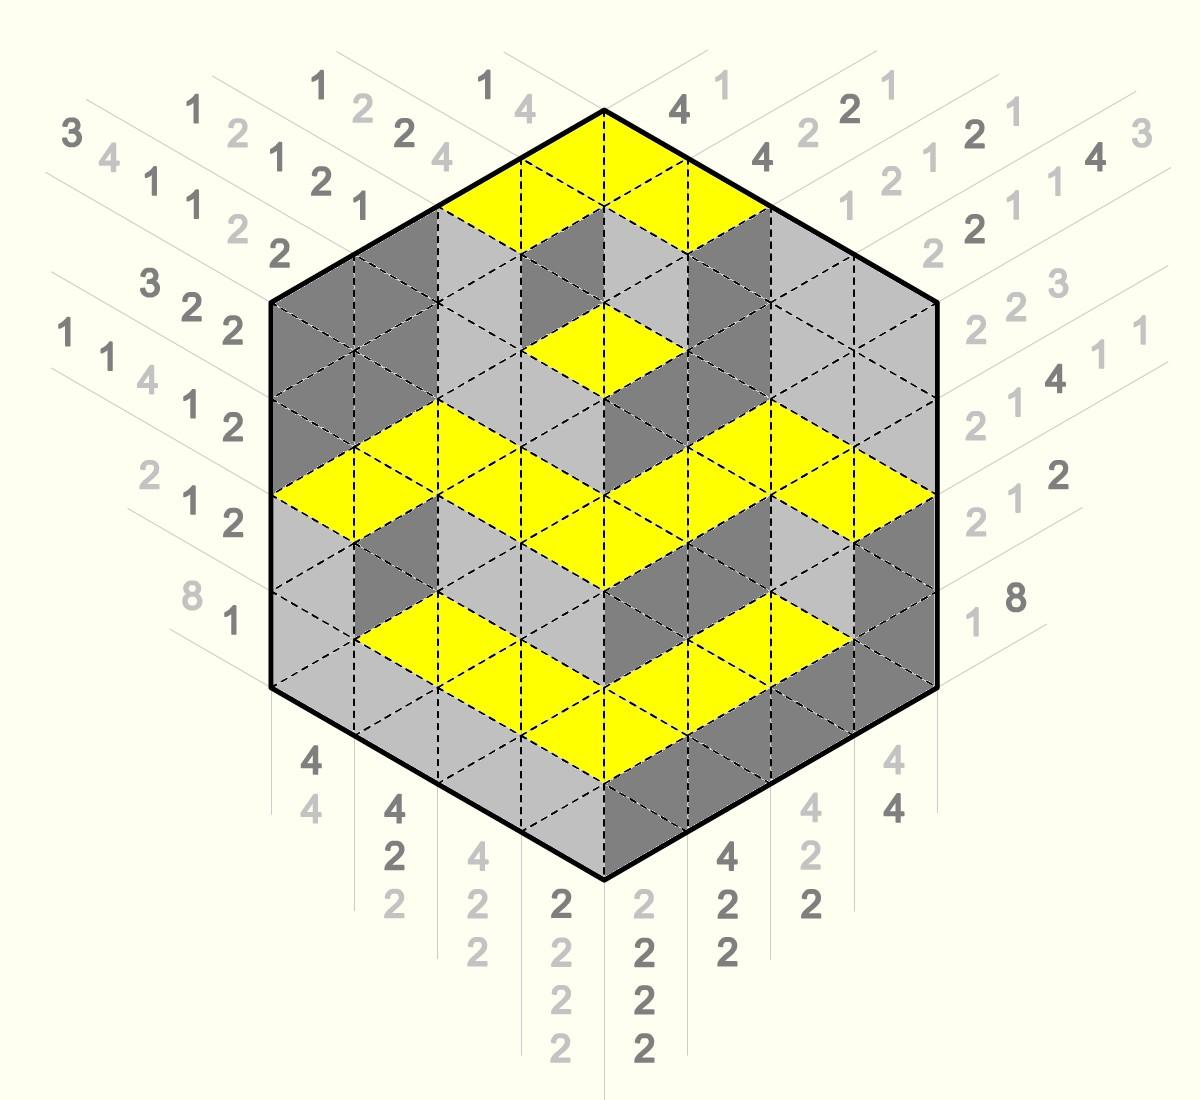 http://www.prise2tete.fr/upload/bidipe-FRiZ-Fre3Dom.jpg